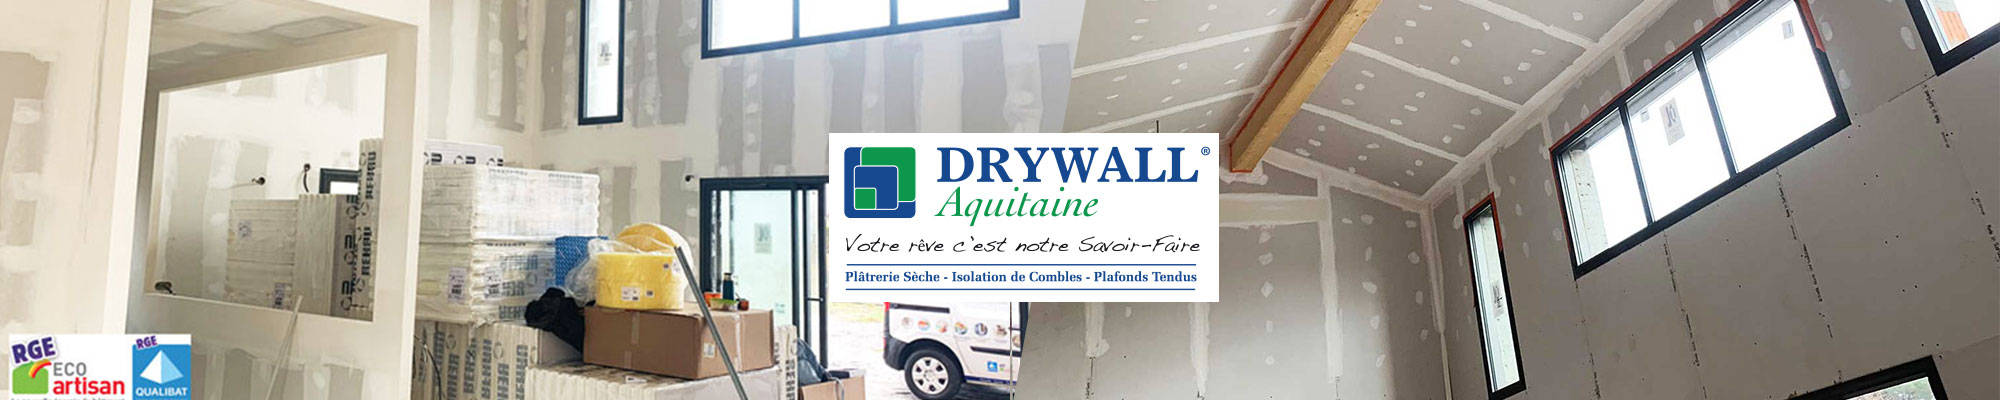 platrerie-salle-drywall-aquitaine